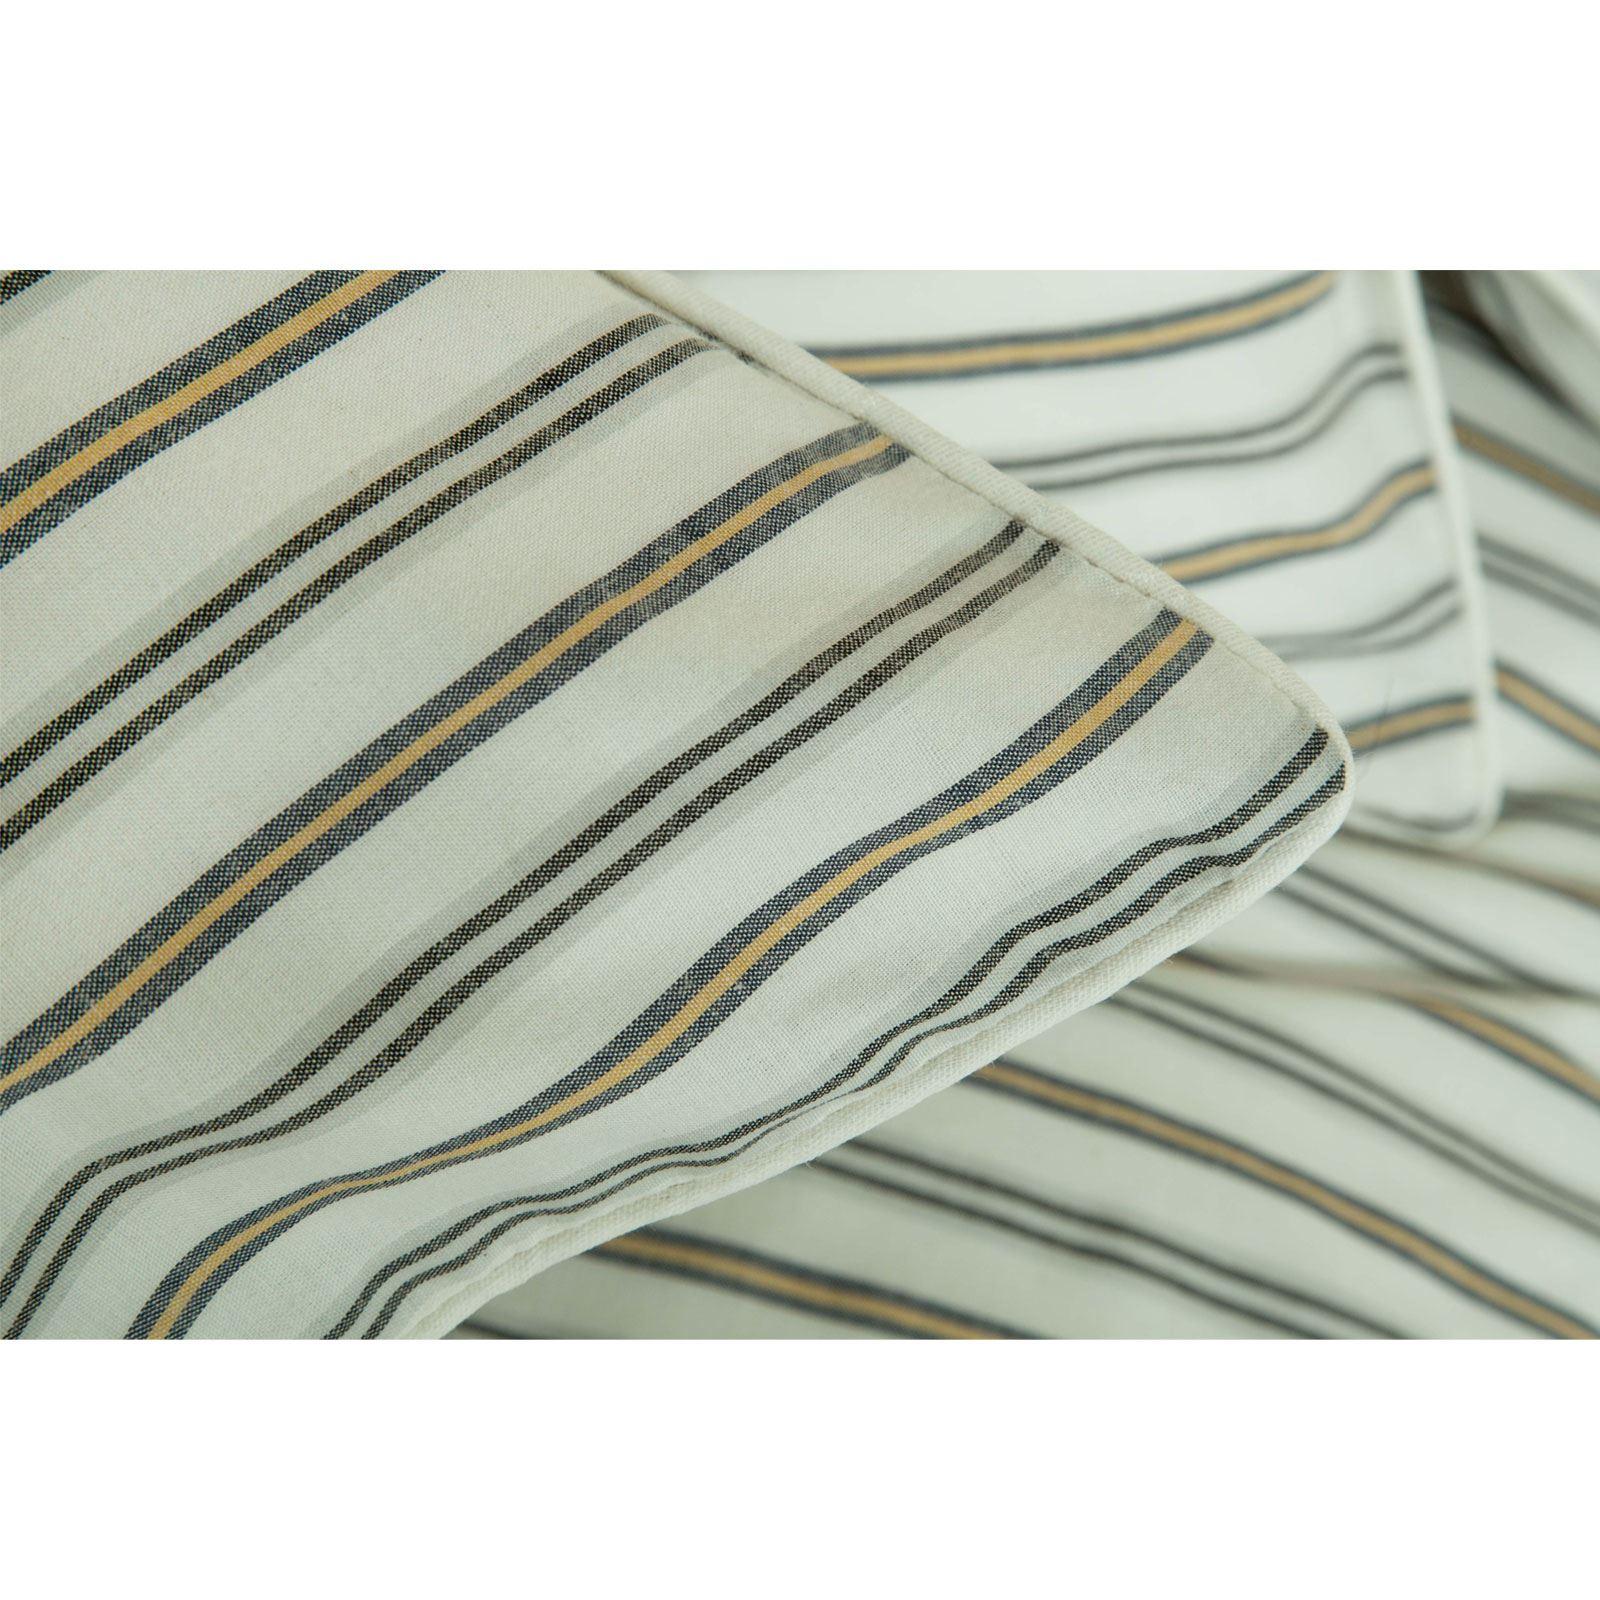 Hilo-de-algodon-de-lujo-Rico-Suave-Chambray-tenido-de-Cubierta-de-edredon-a-rayas-de-tejido-a-rayas miniatura 17